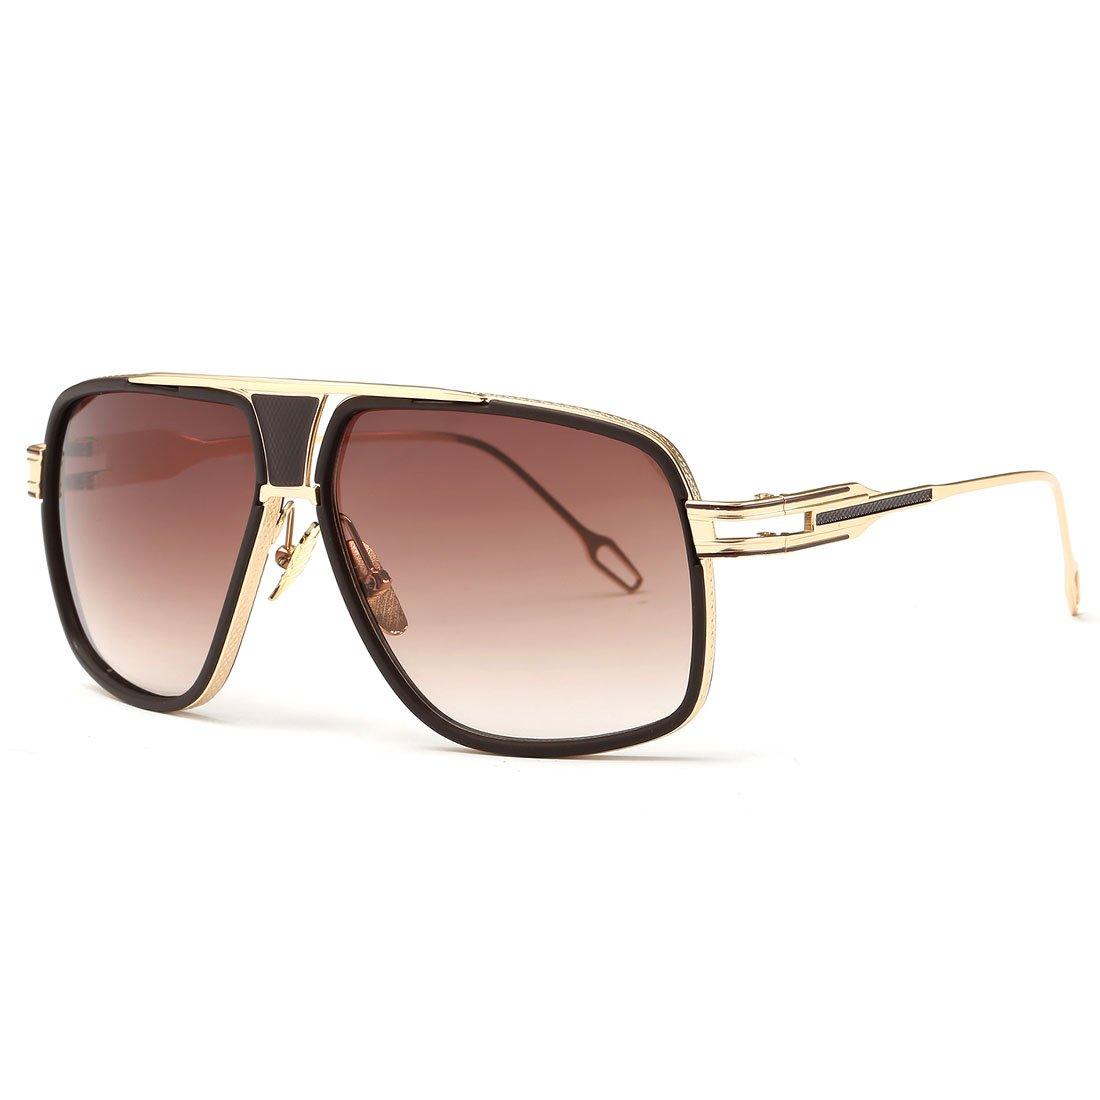 AEVOGUE Sunglasses For Men Goggle Alloy Frame Brand Designer AE0336 (Gold&Brown, 62) by AEVOGUE